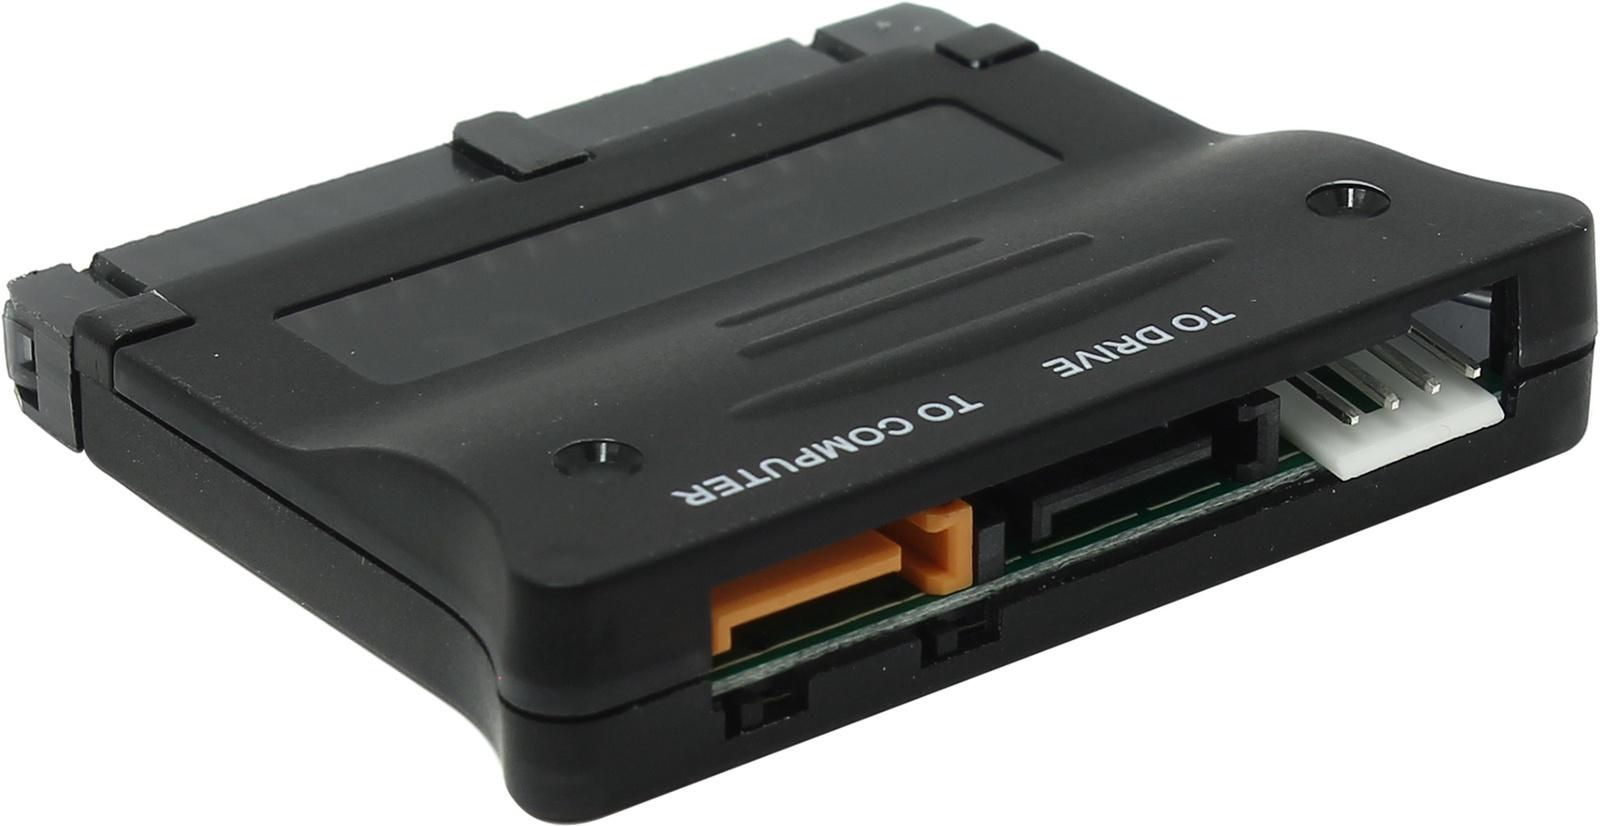 Адаптер-переходник Espada FG-BSA2-S1-1IDE, Конвертер SATA to IDE / IDE to SATA (двунаправленный), черно-серый адаптер c7 sata ide 44p 2 5 sata ide 2 5